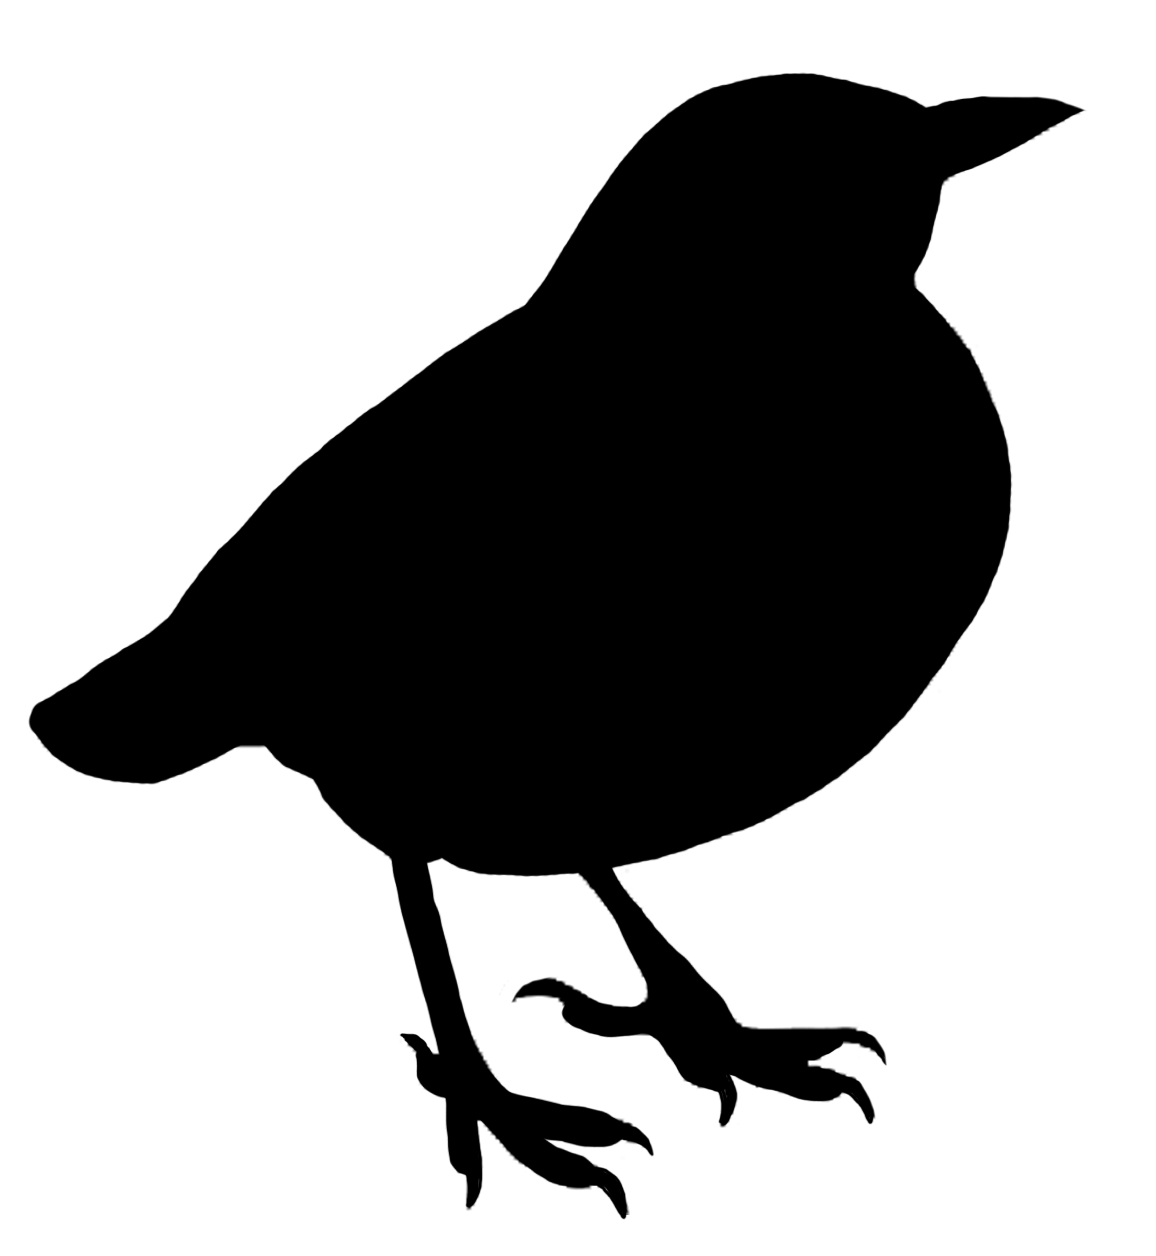 Bird transparent. Silhouette clipart png stickpng